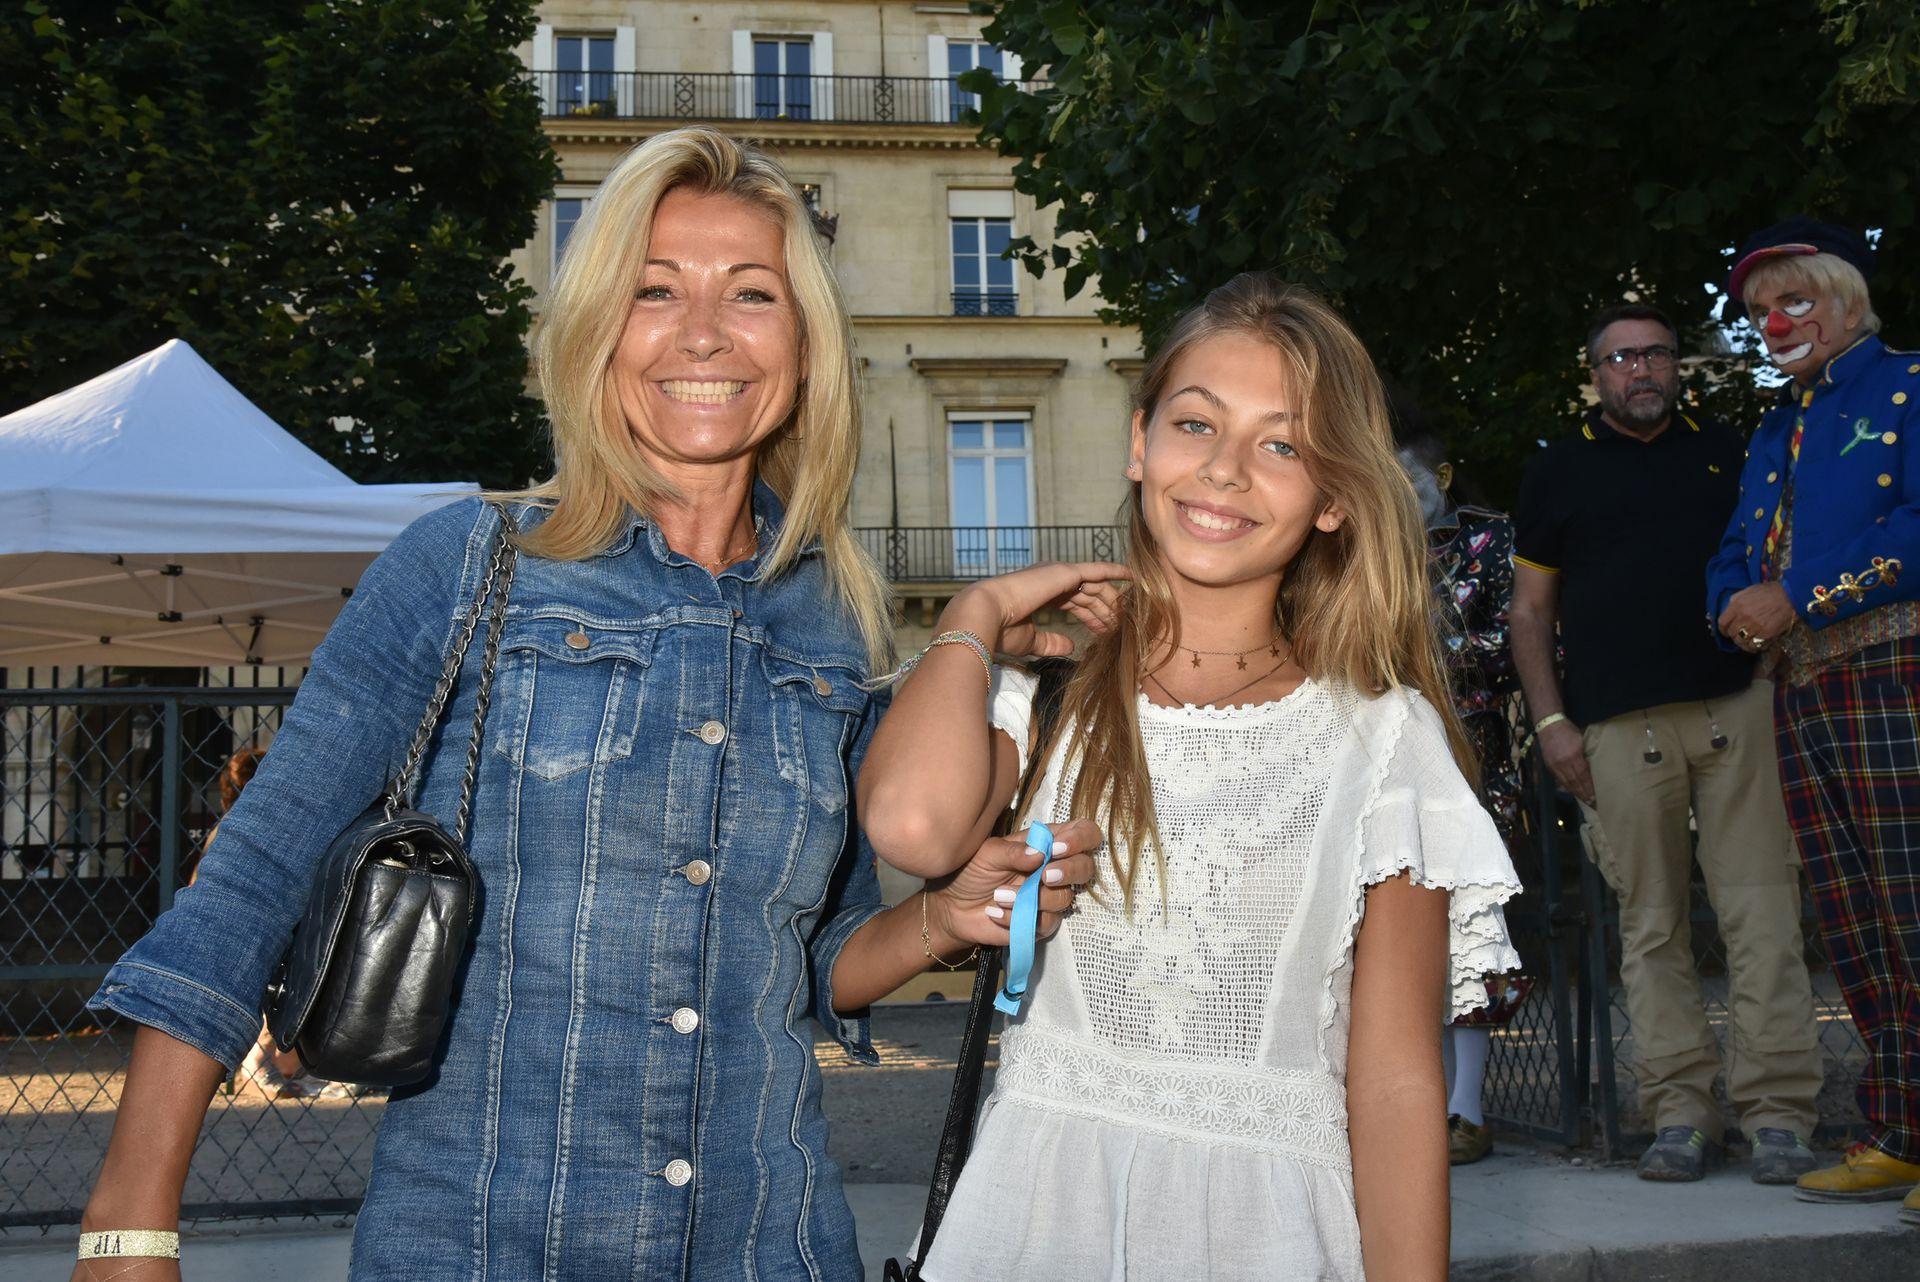 Natty Tardivel Belmondo y su hija Stella, la cuarta descendiente de Jean Paul Belmondo